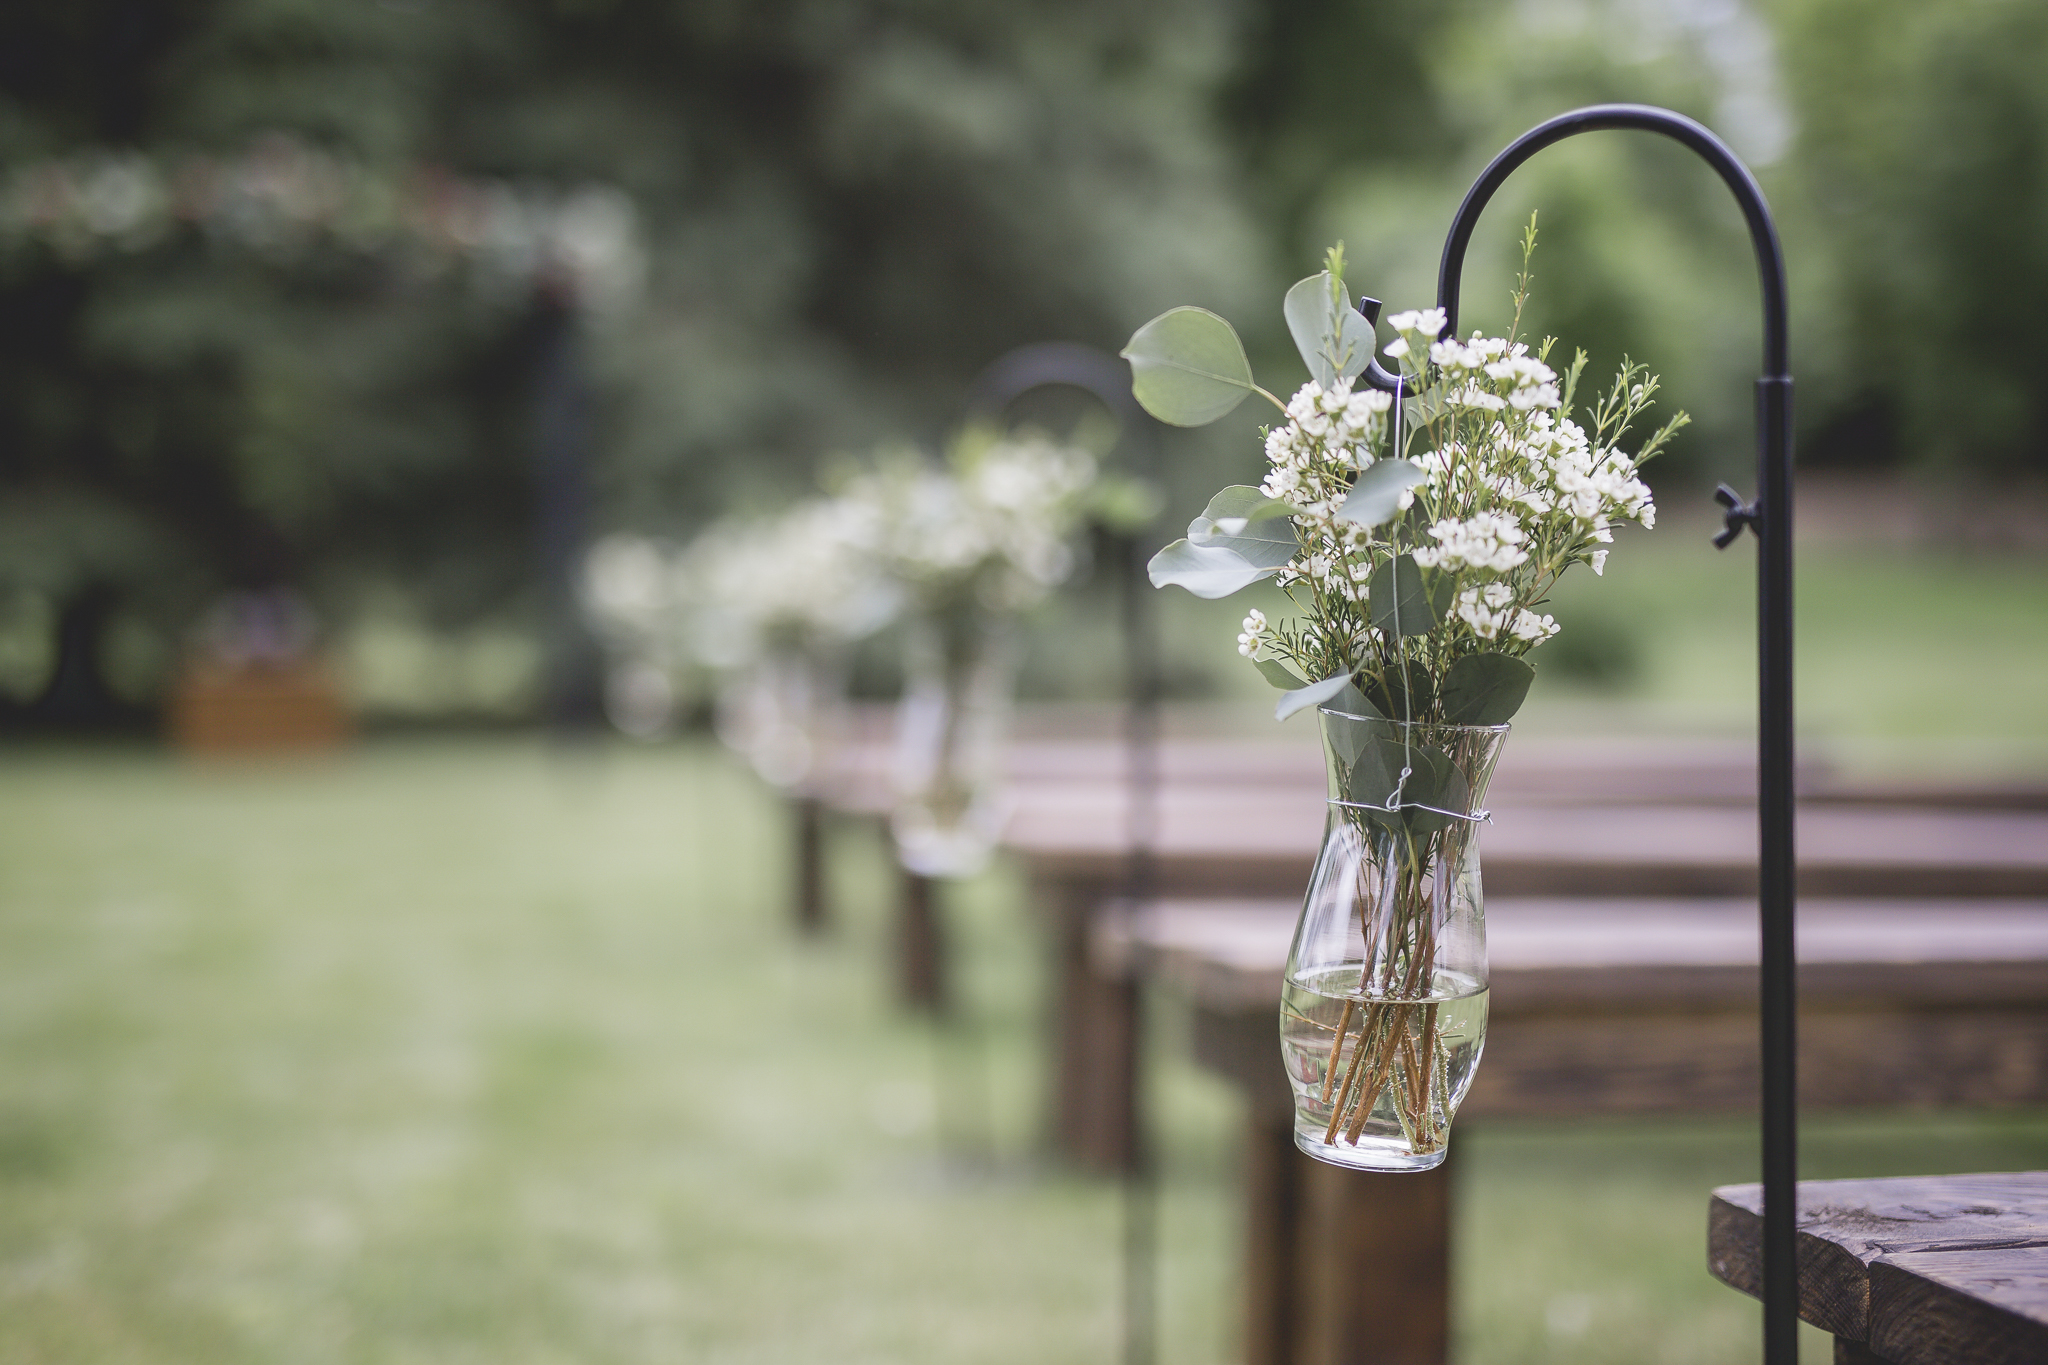 minnesota family farm outdoor wedding photographer-40.jpg